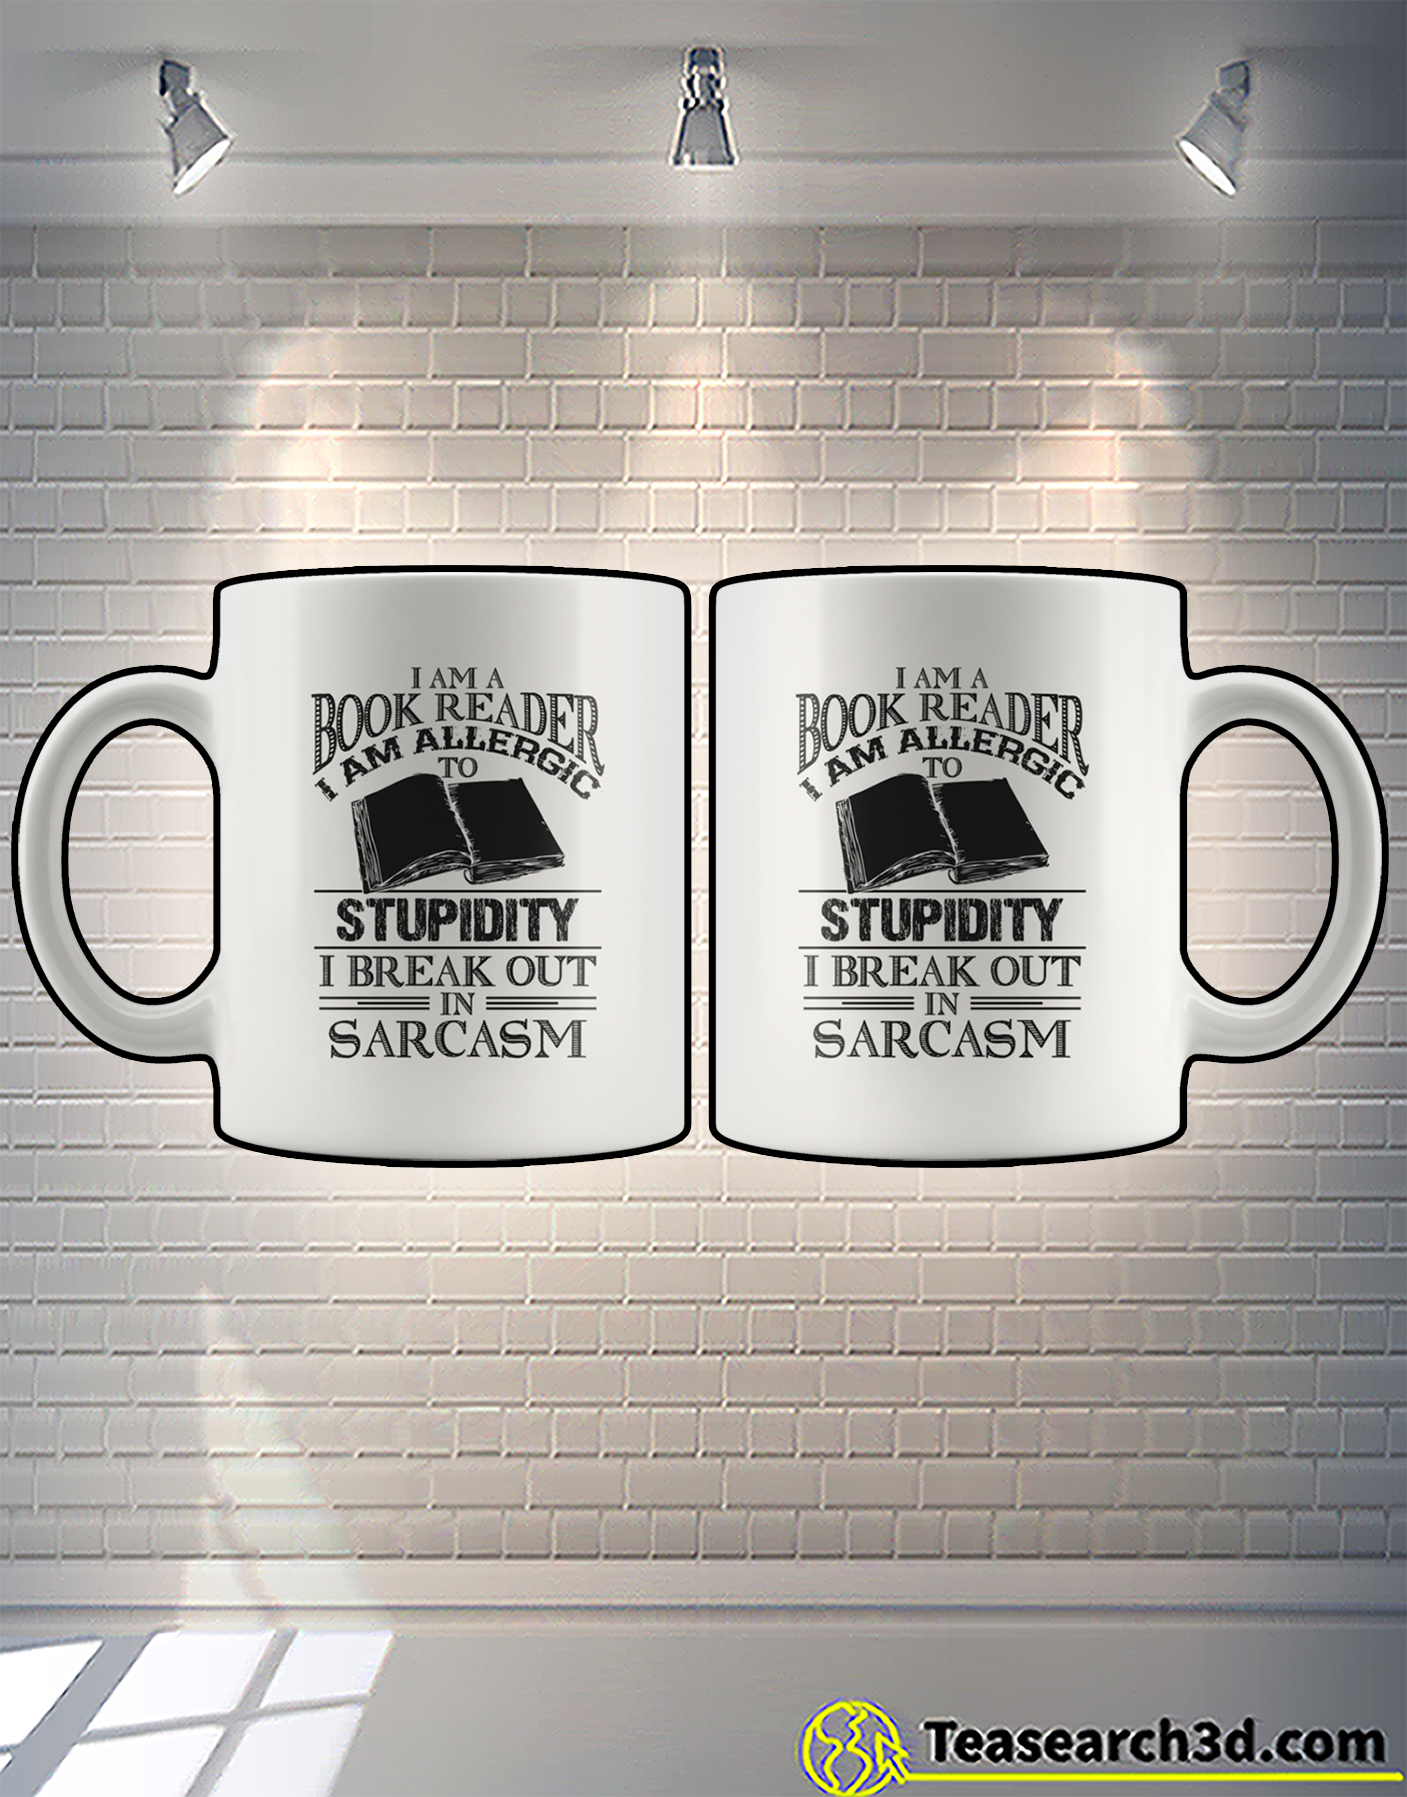 I am a book reader I am allergic to stupidity I break out in sarcasm mug 1